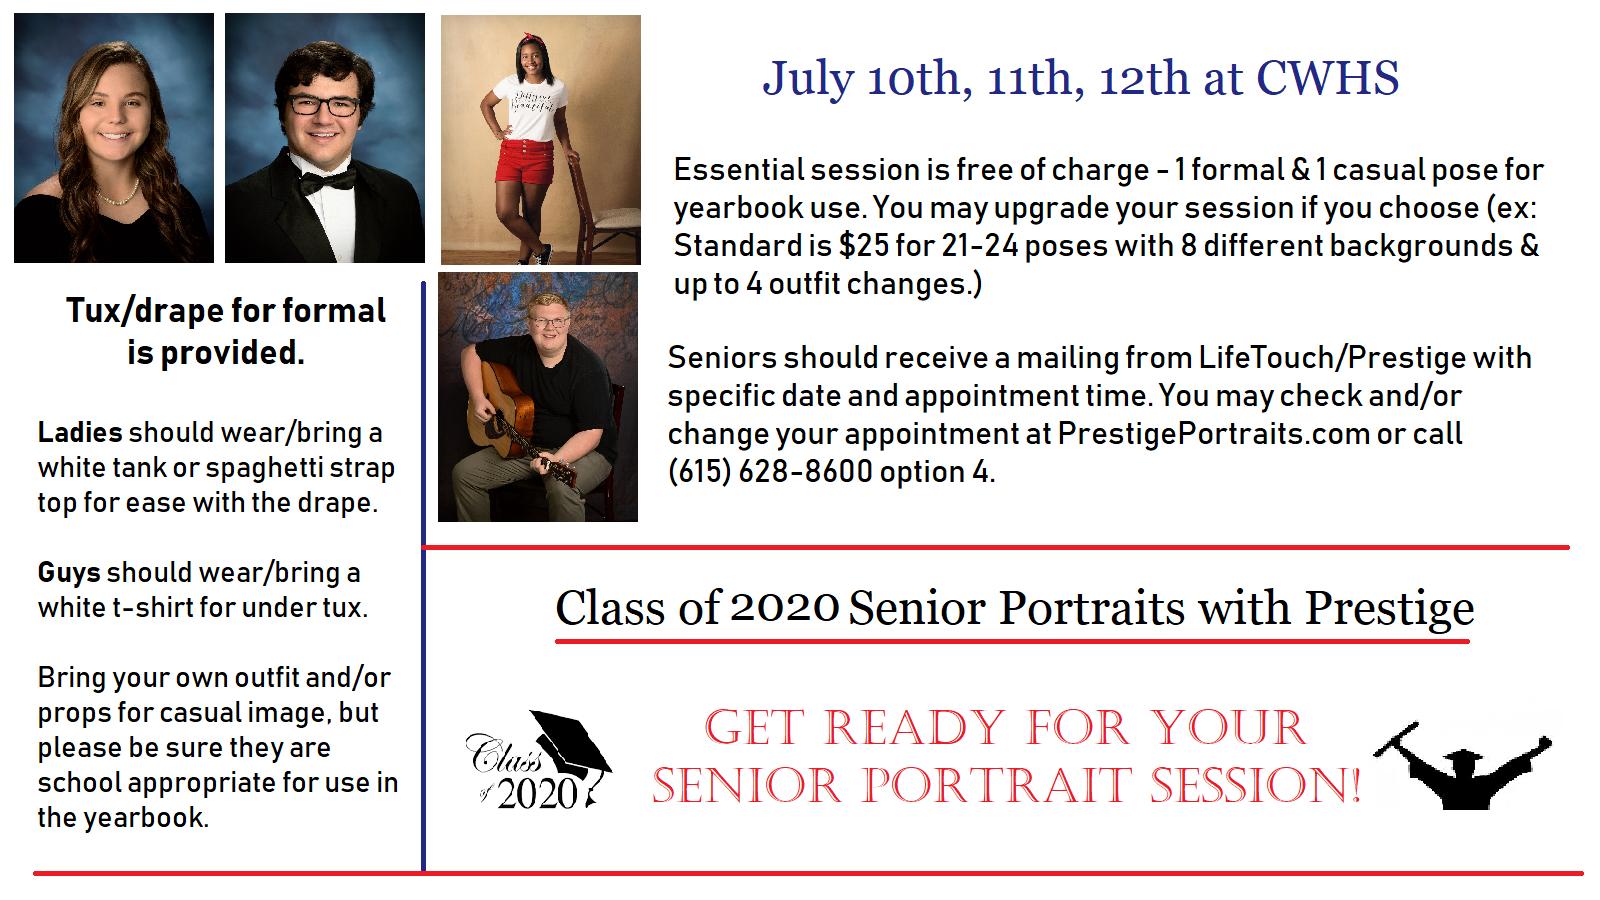 Class of 2020 Senior Portraits